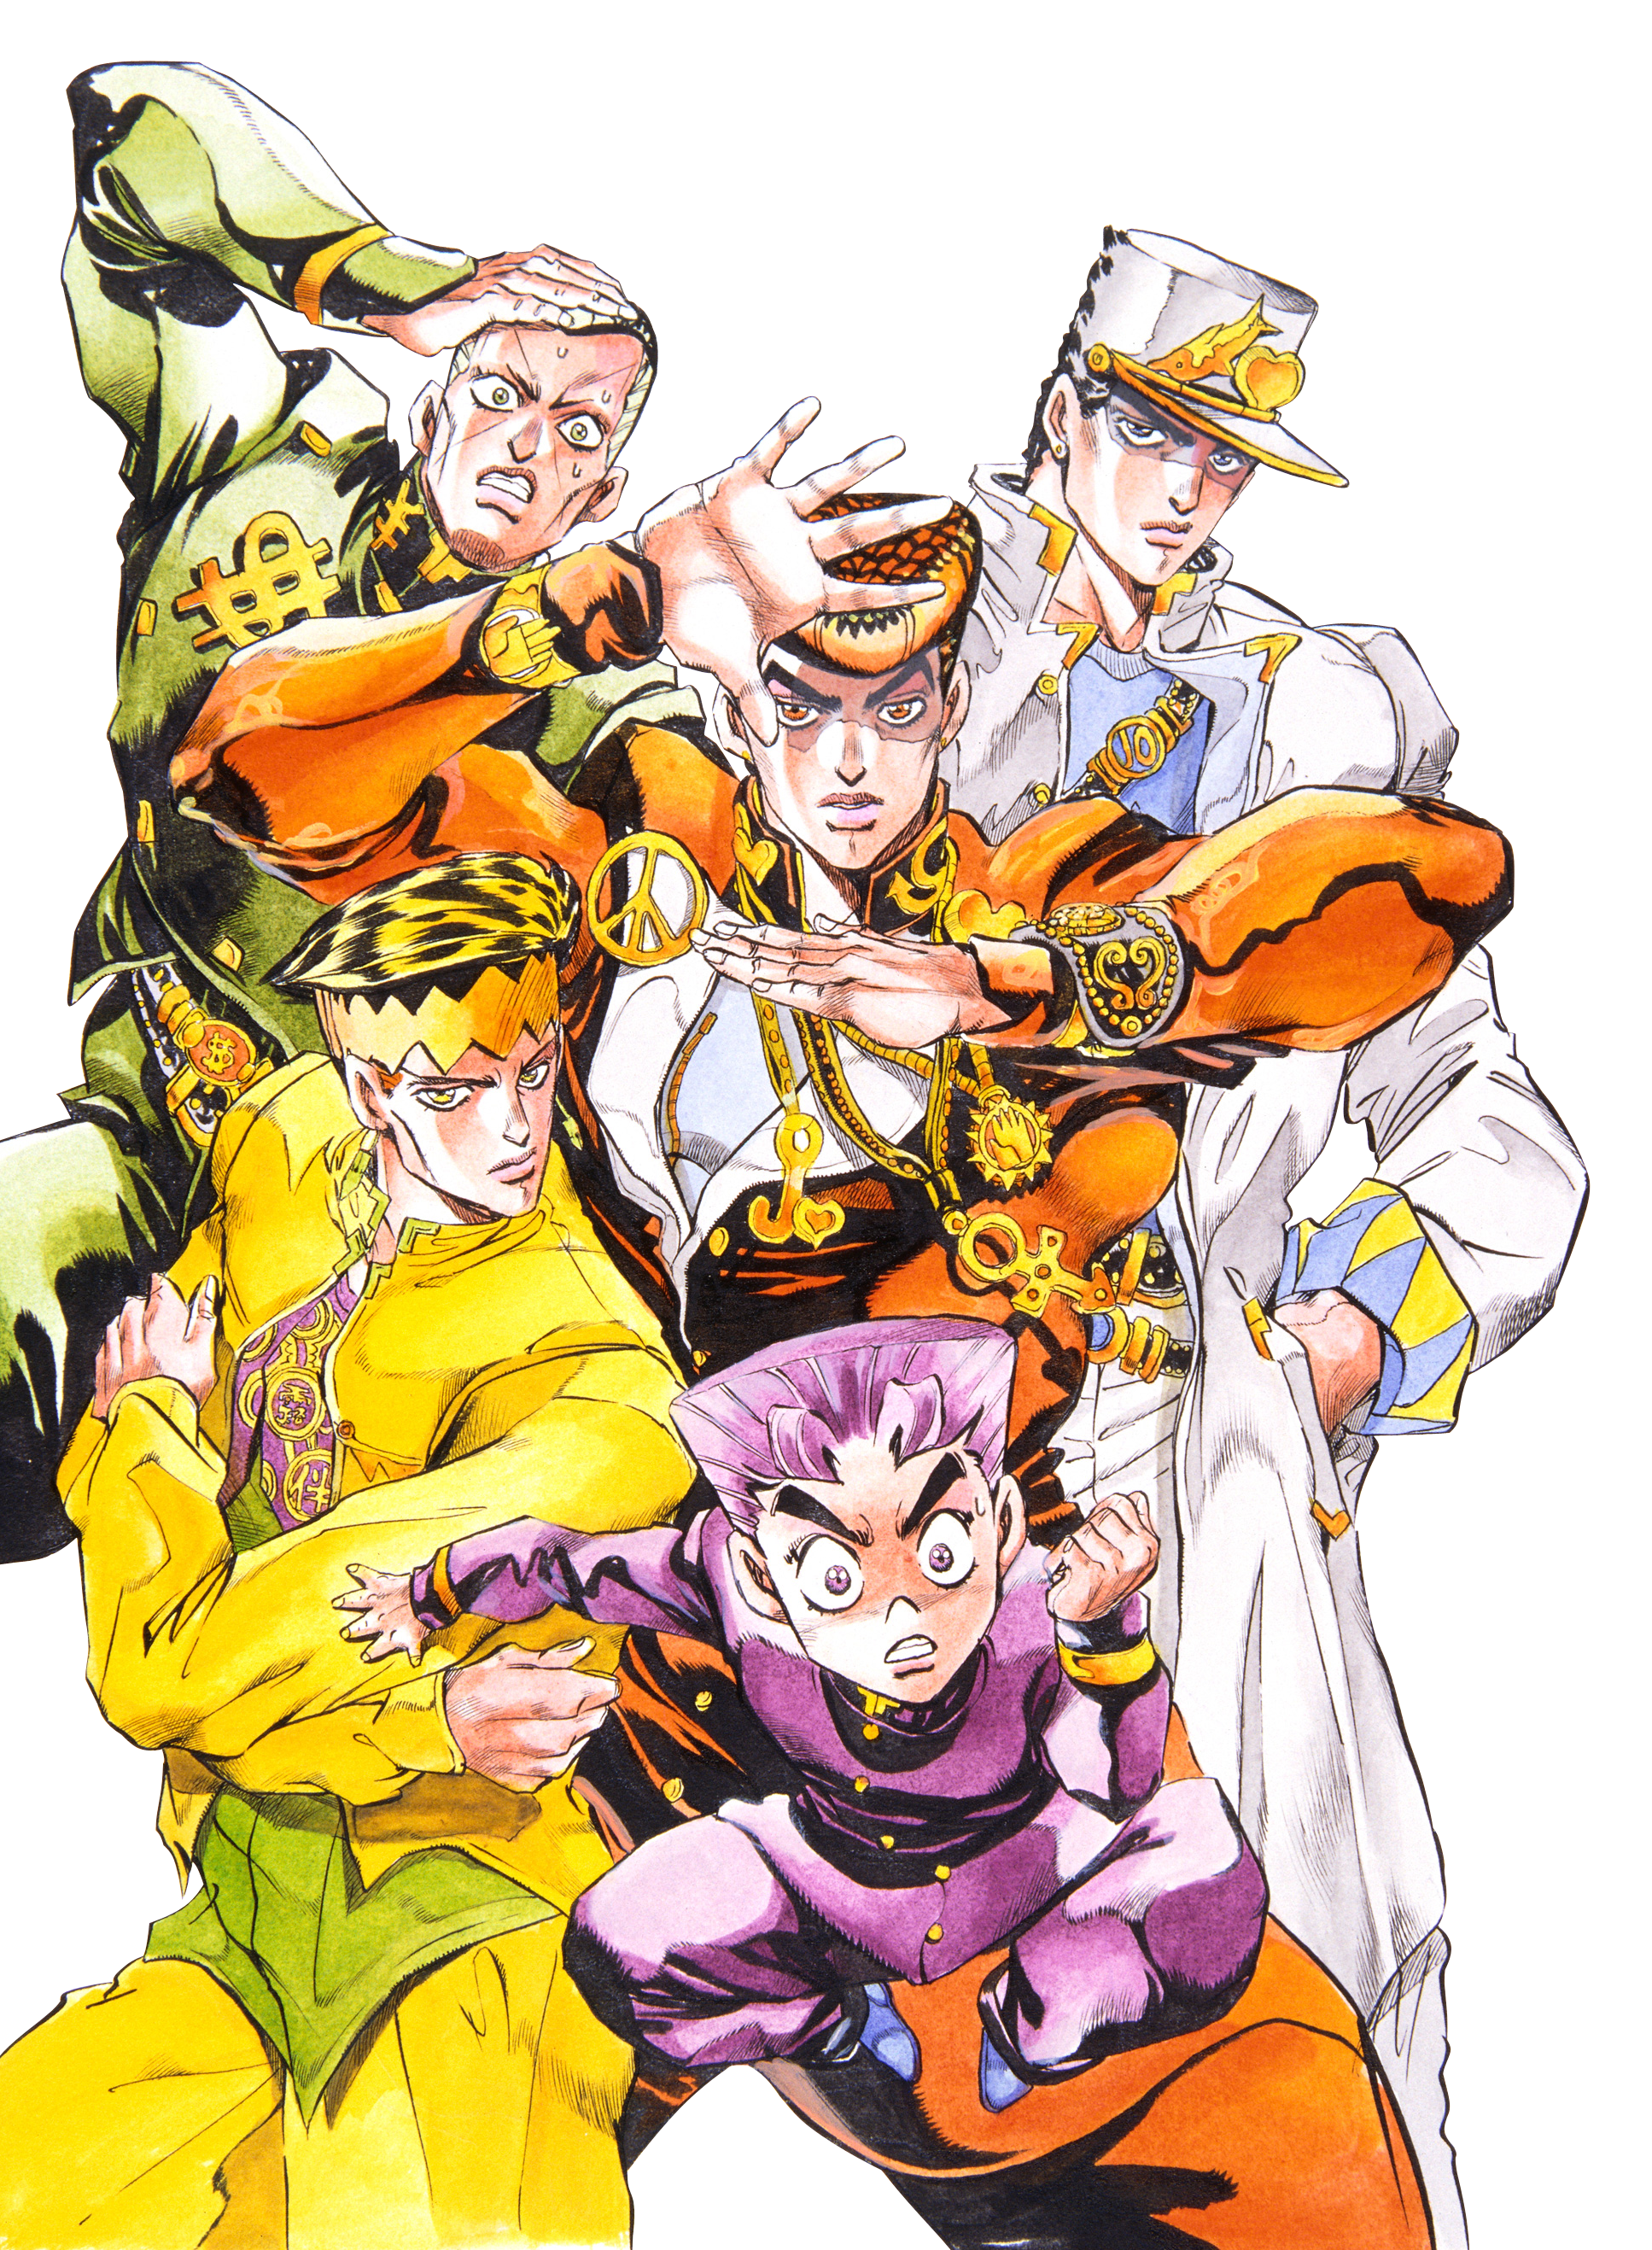 Jojo Bizarre Adventure Wallpaper Google Search Jojo Bizarre Jojo Bizzare Adventure Jojo S Bizarre Adventure Anime